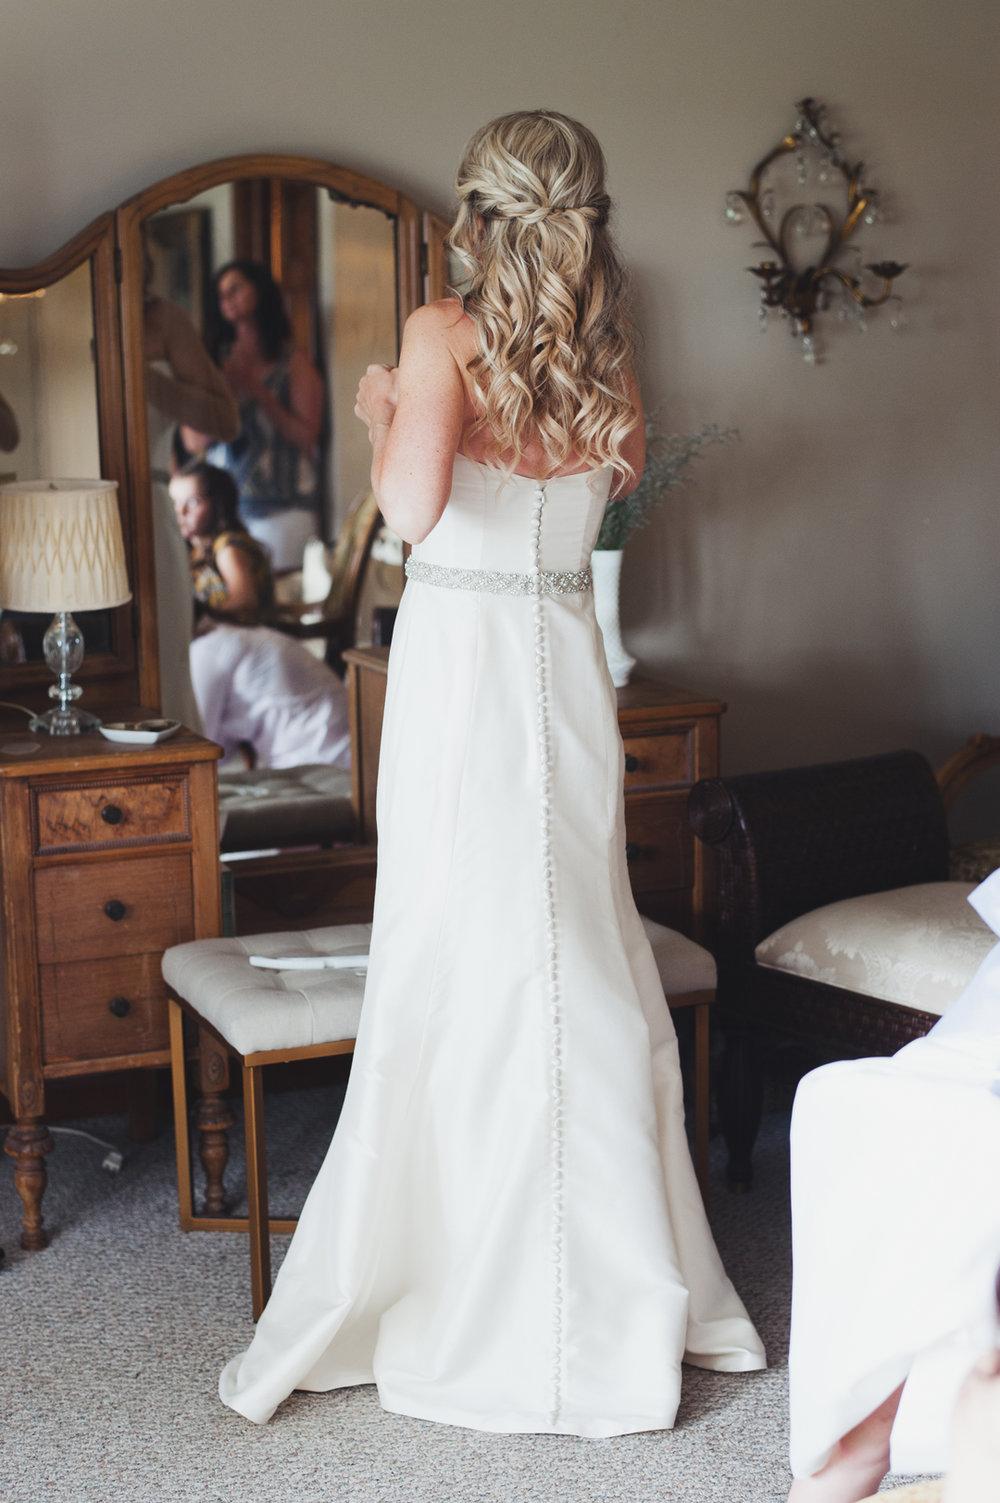 Simple and Elegant Bridal Gown Chicago Farm Wedding Elite Photo